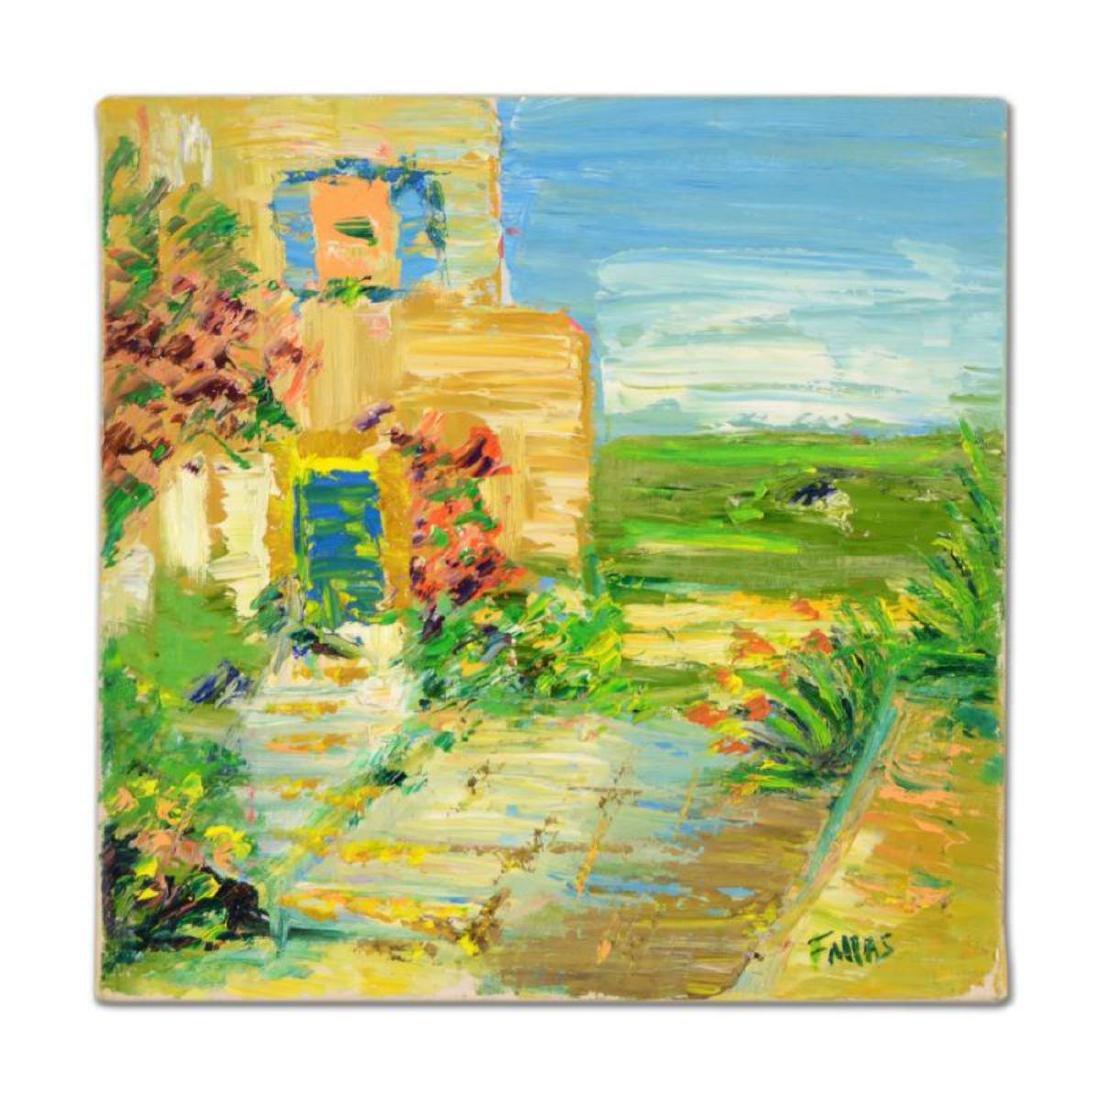 "Elliot Fallas - ""Summer Moments"" Original Oil Painting"